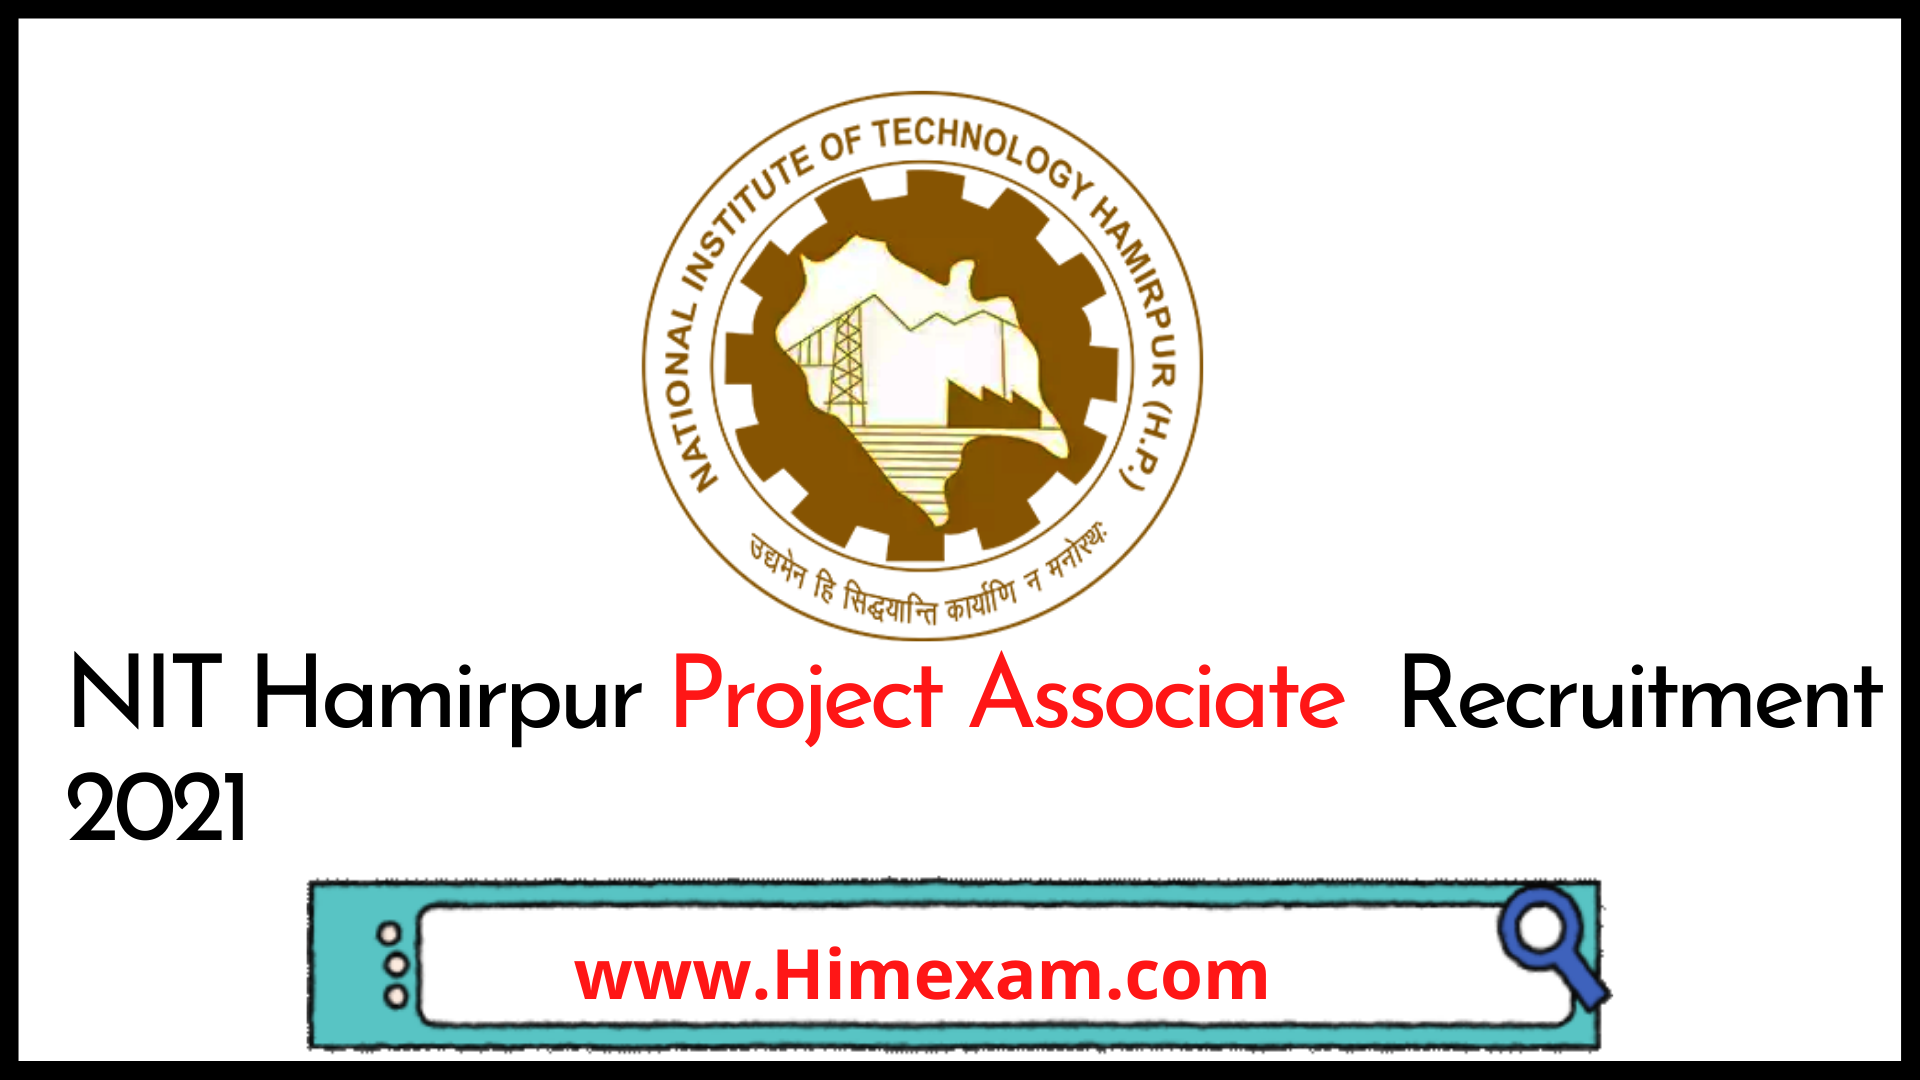 NIT Hamirpur Project Associate  Recruitment 2021